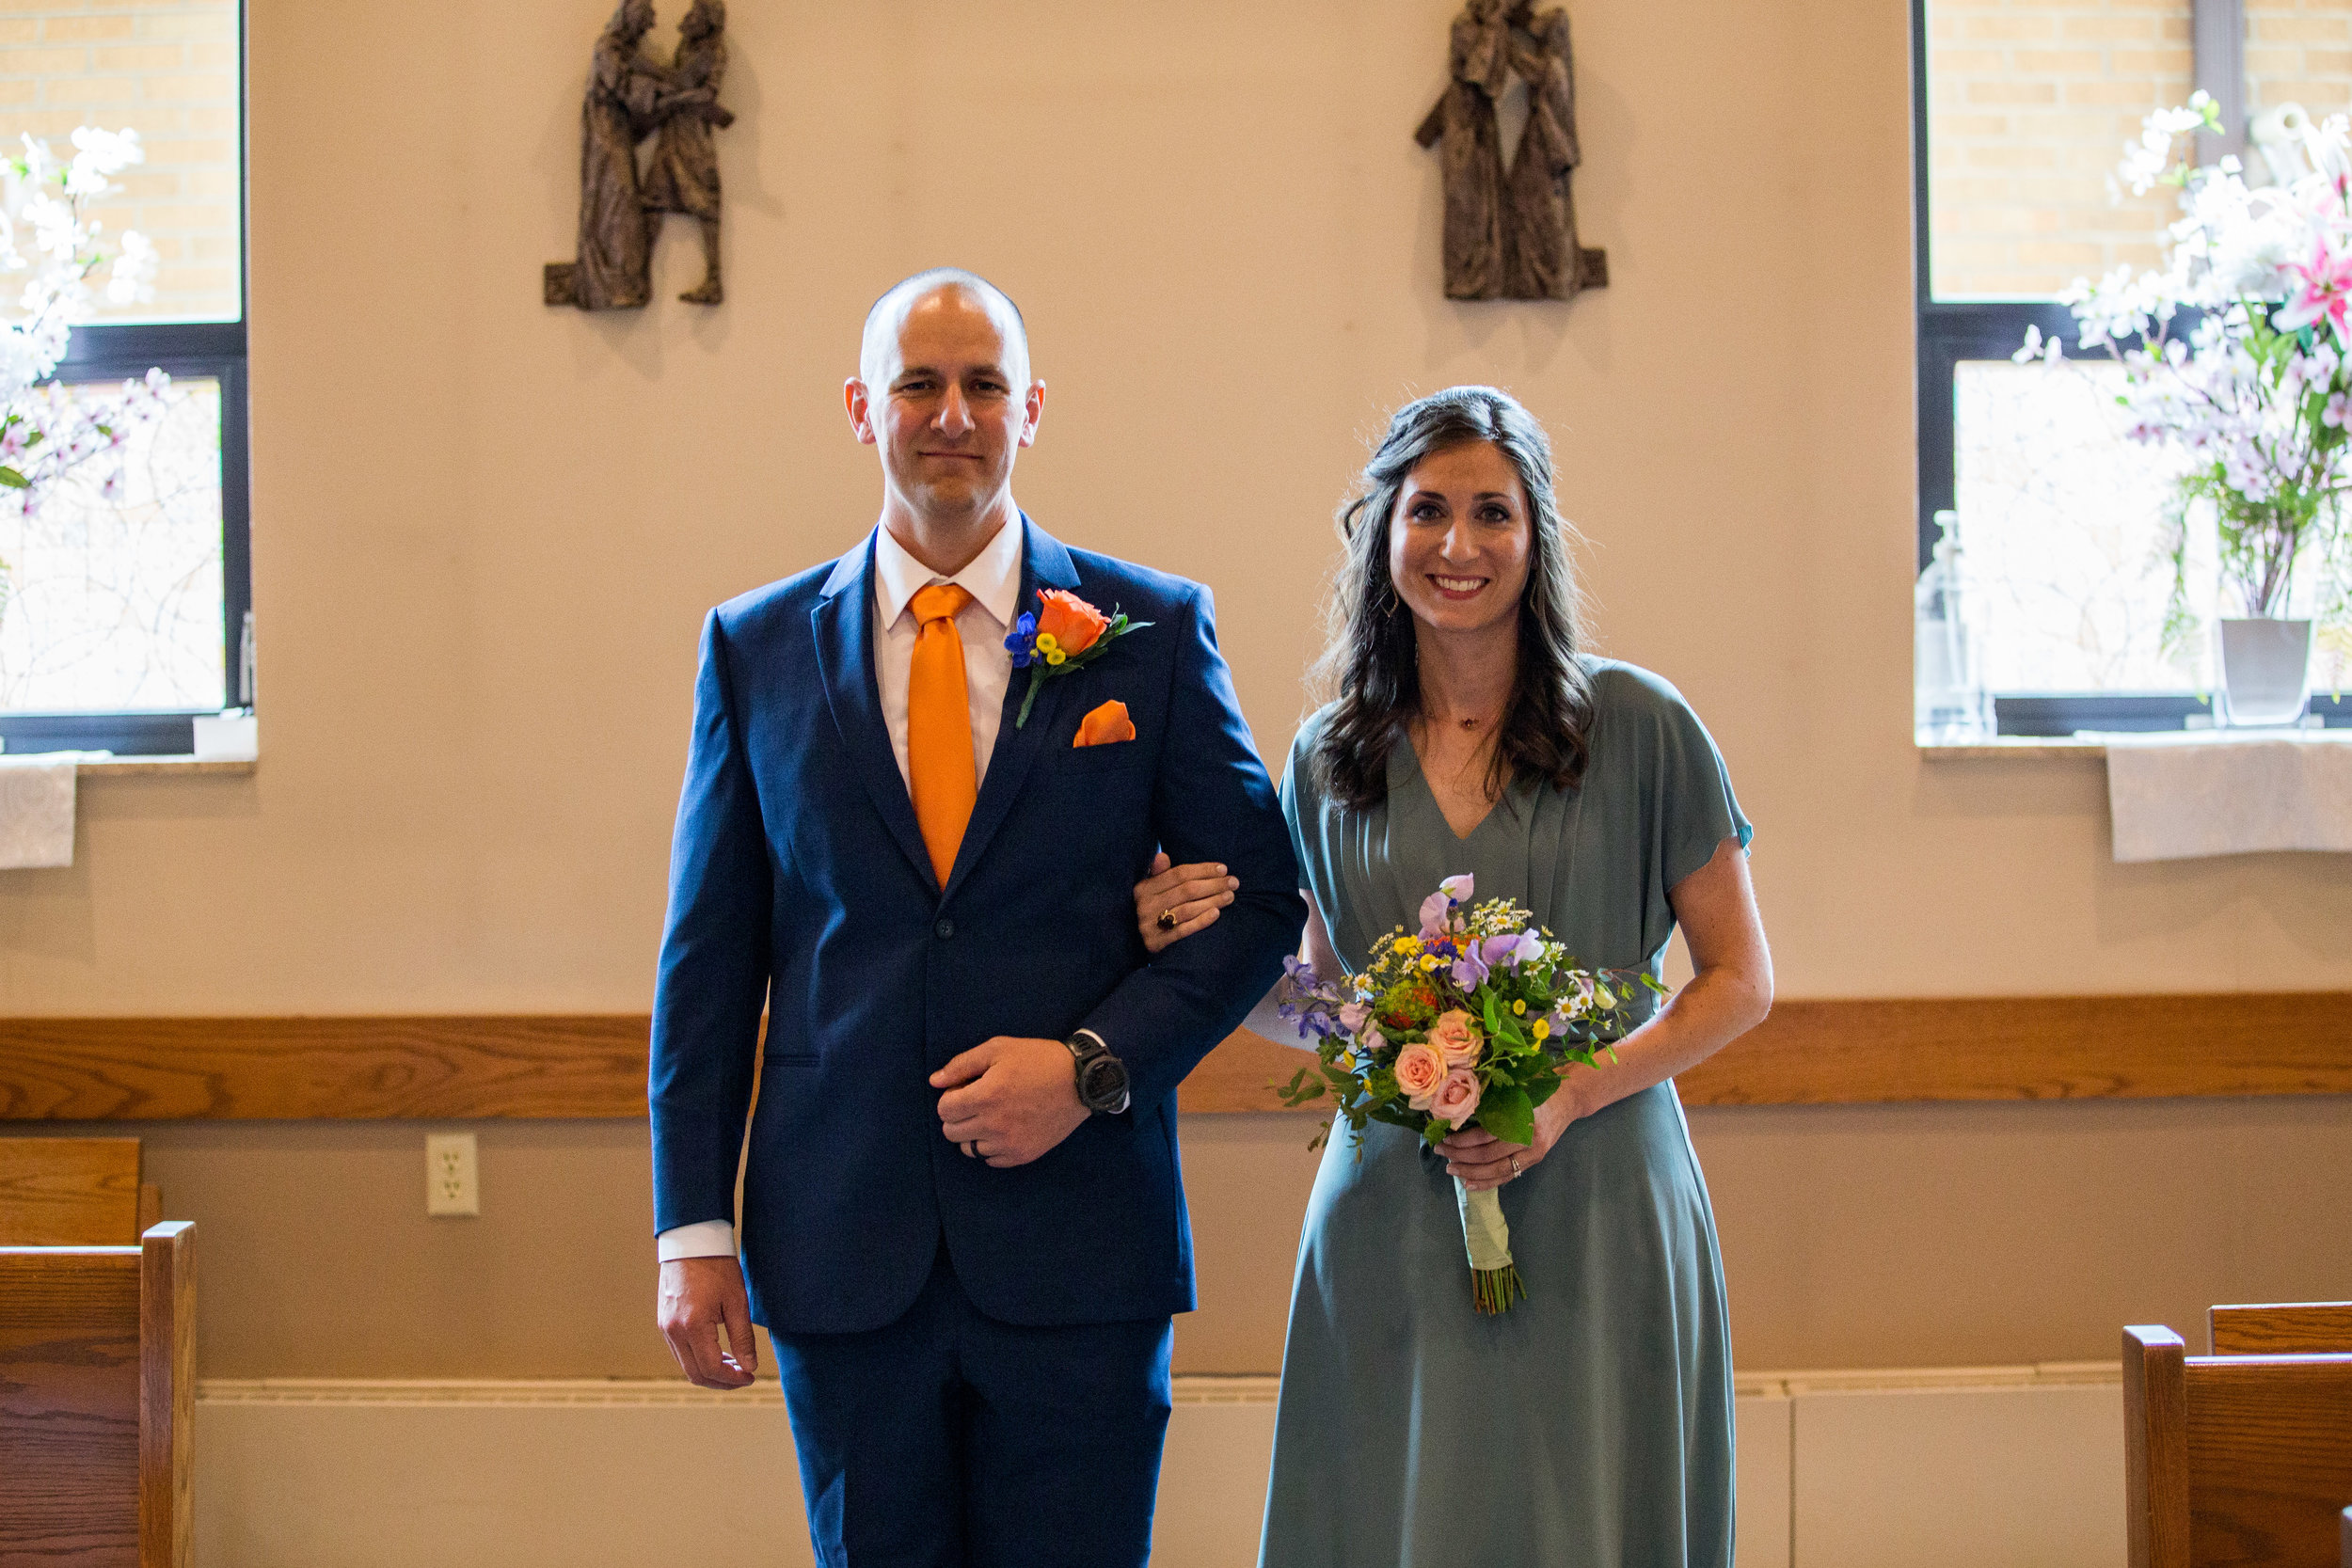 Natalie and Dallas Mooney Wedding 6-8-19_Tania Watt Photography-64.jpg